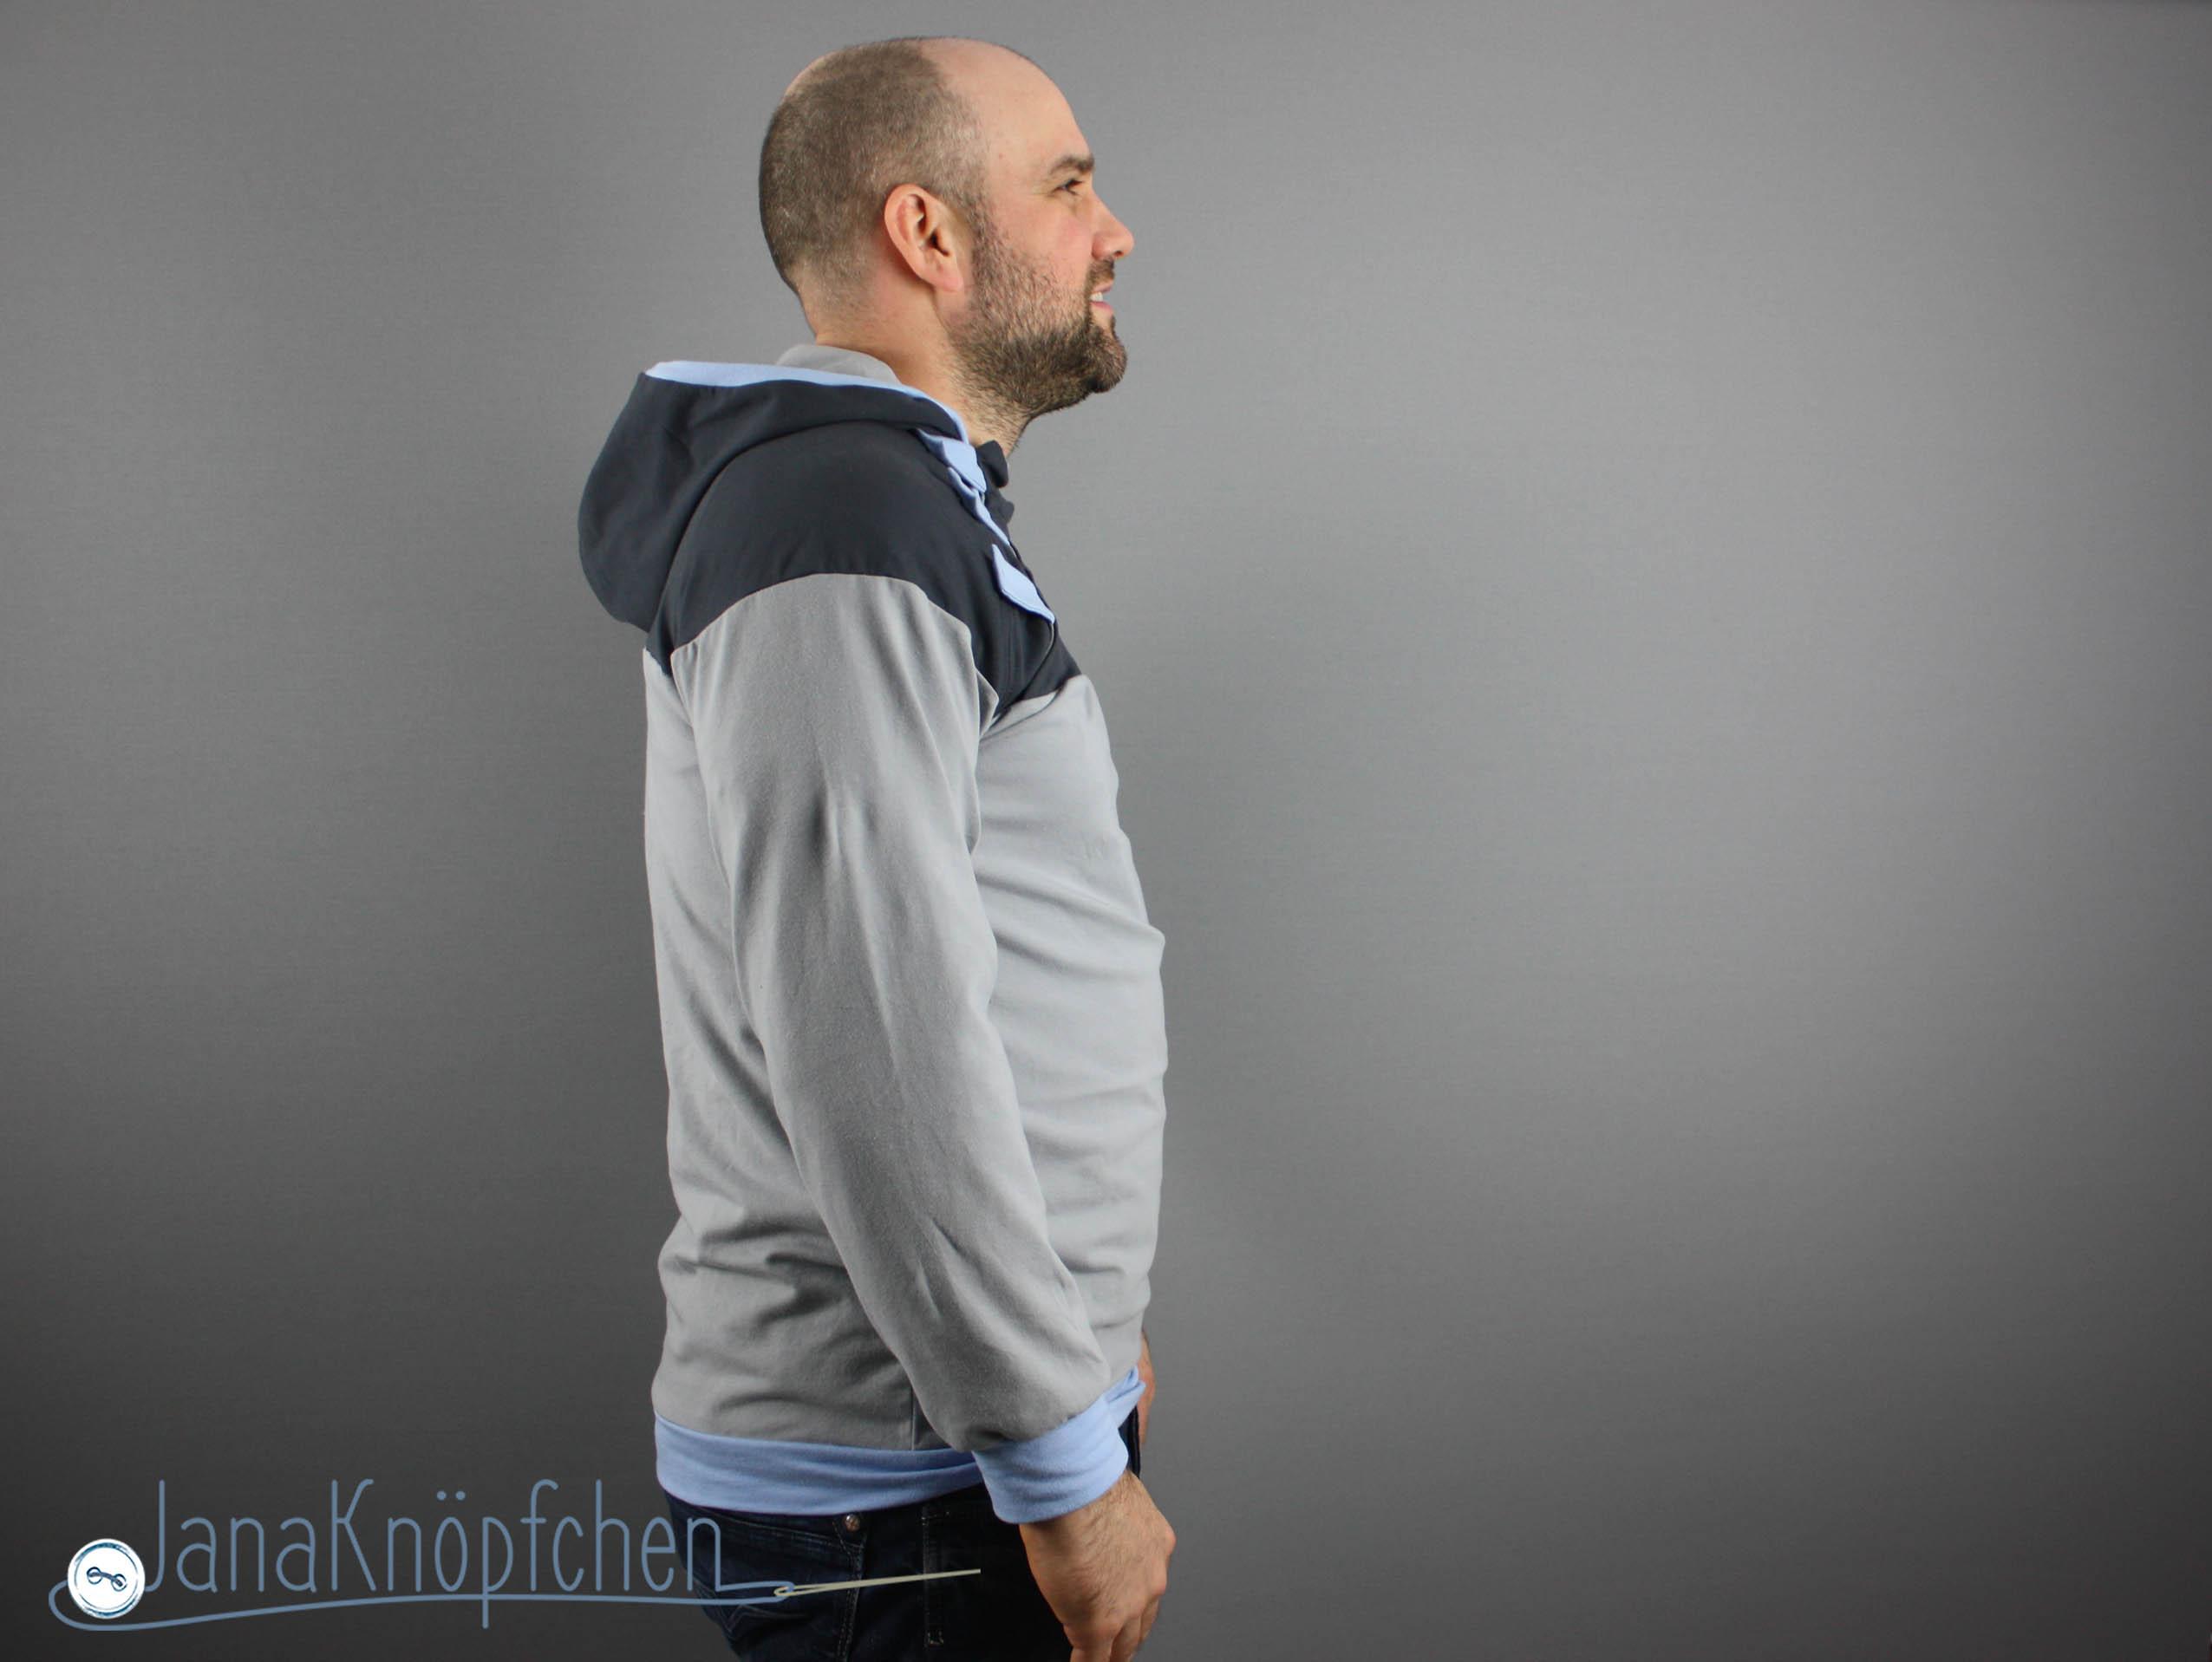 Hoodie Letz Knöpf für Männer nähen. JanaKnöpfchen. Nähen für Jungs - Nähblog